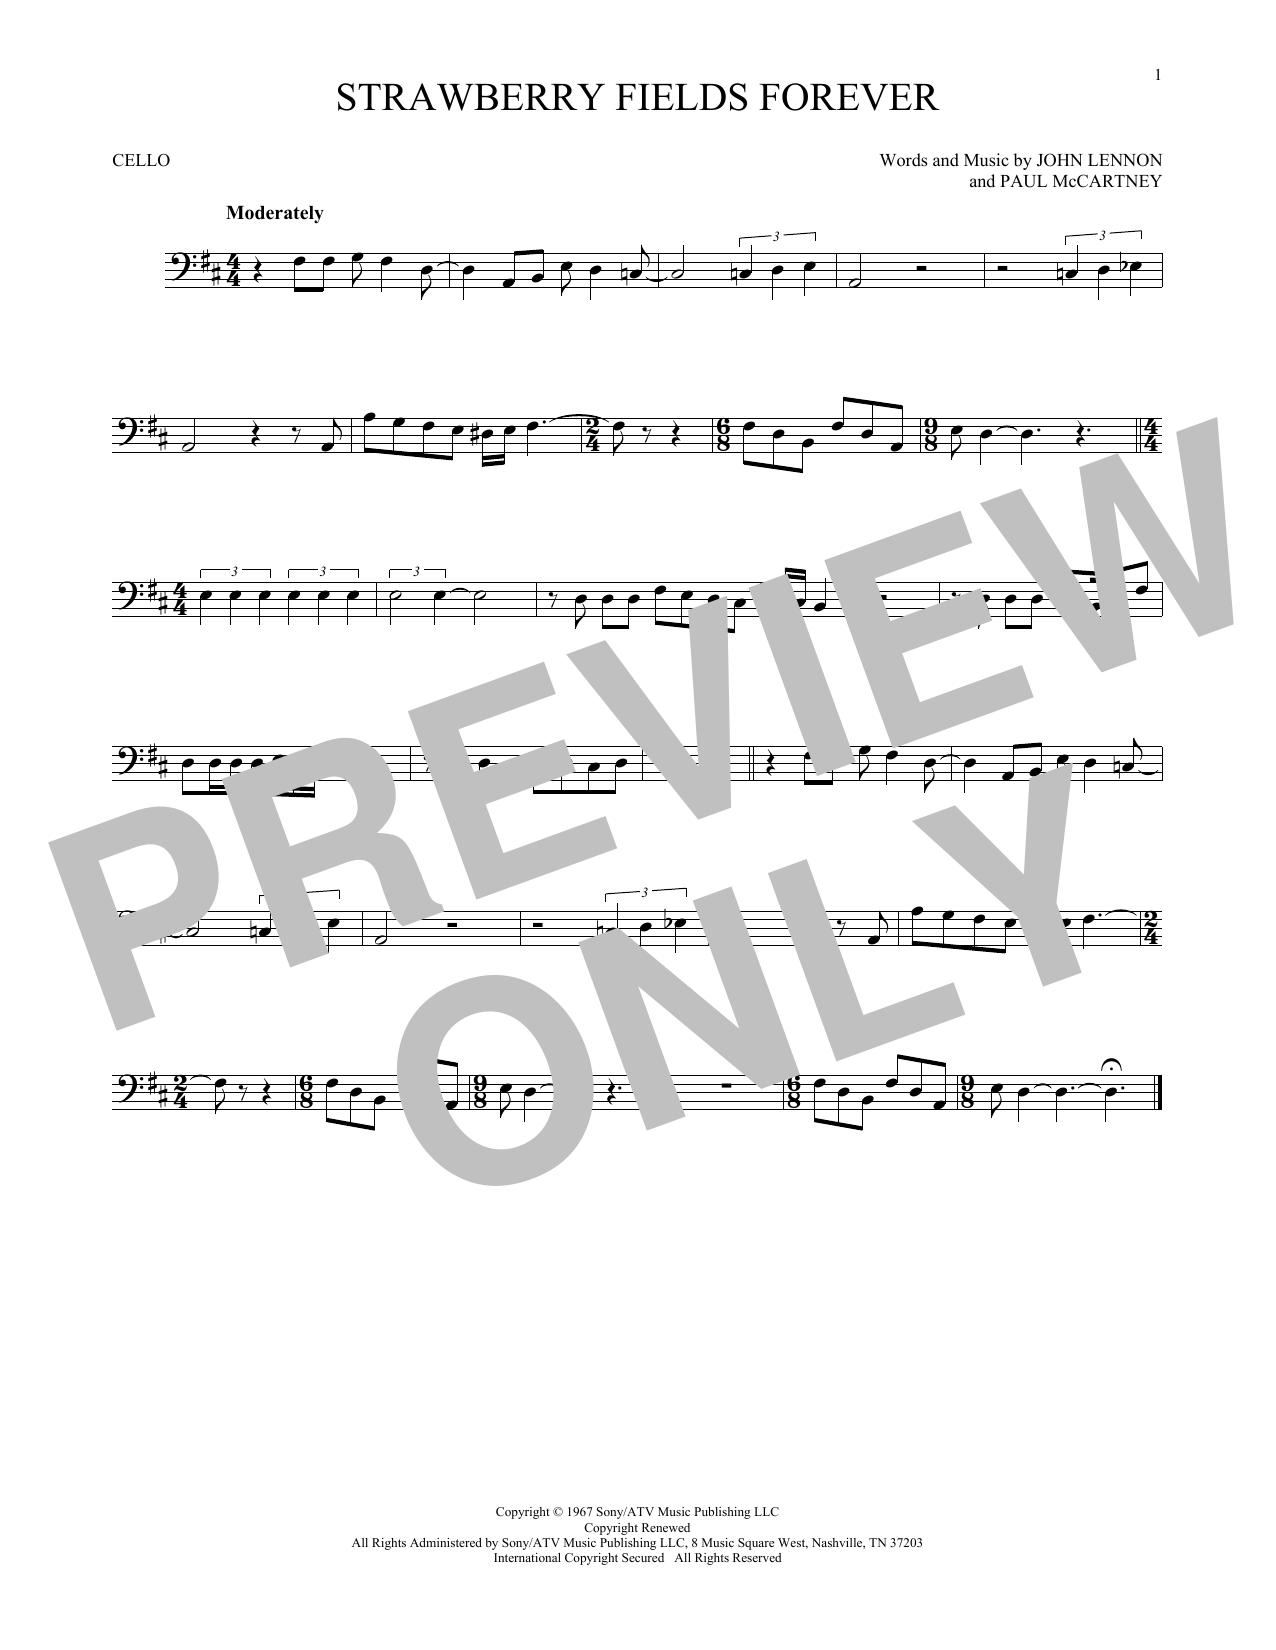 Strawberry Fields Forever (Cello Solo)